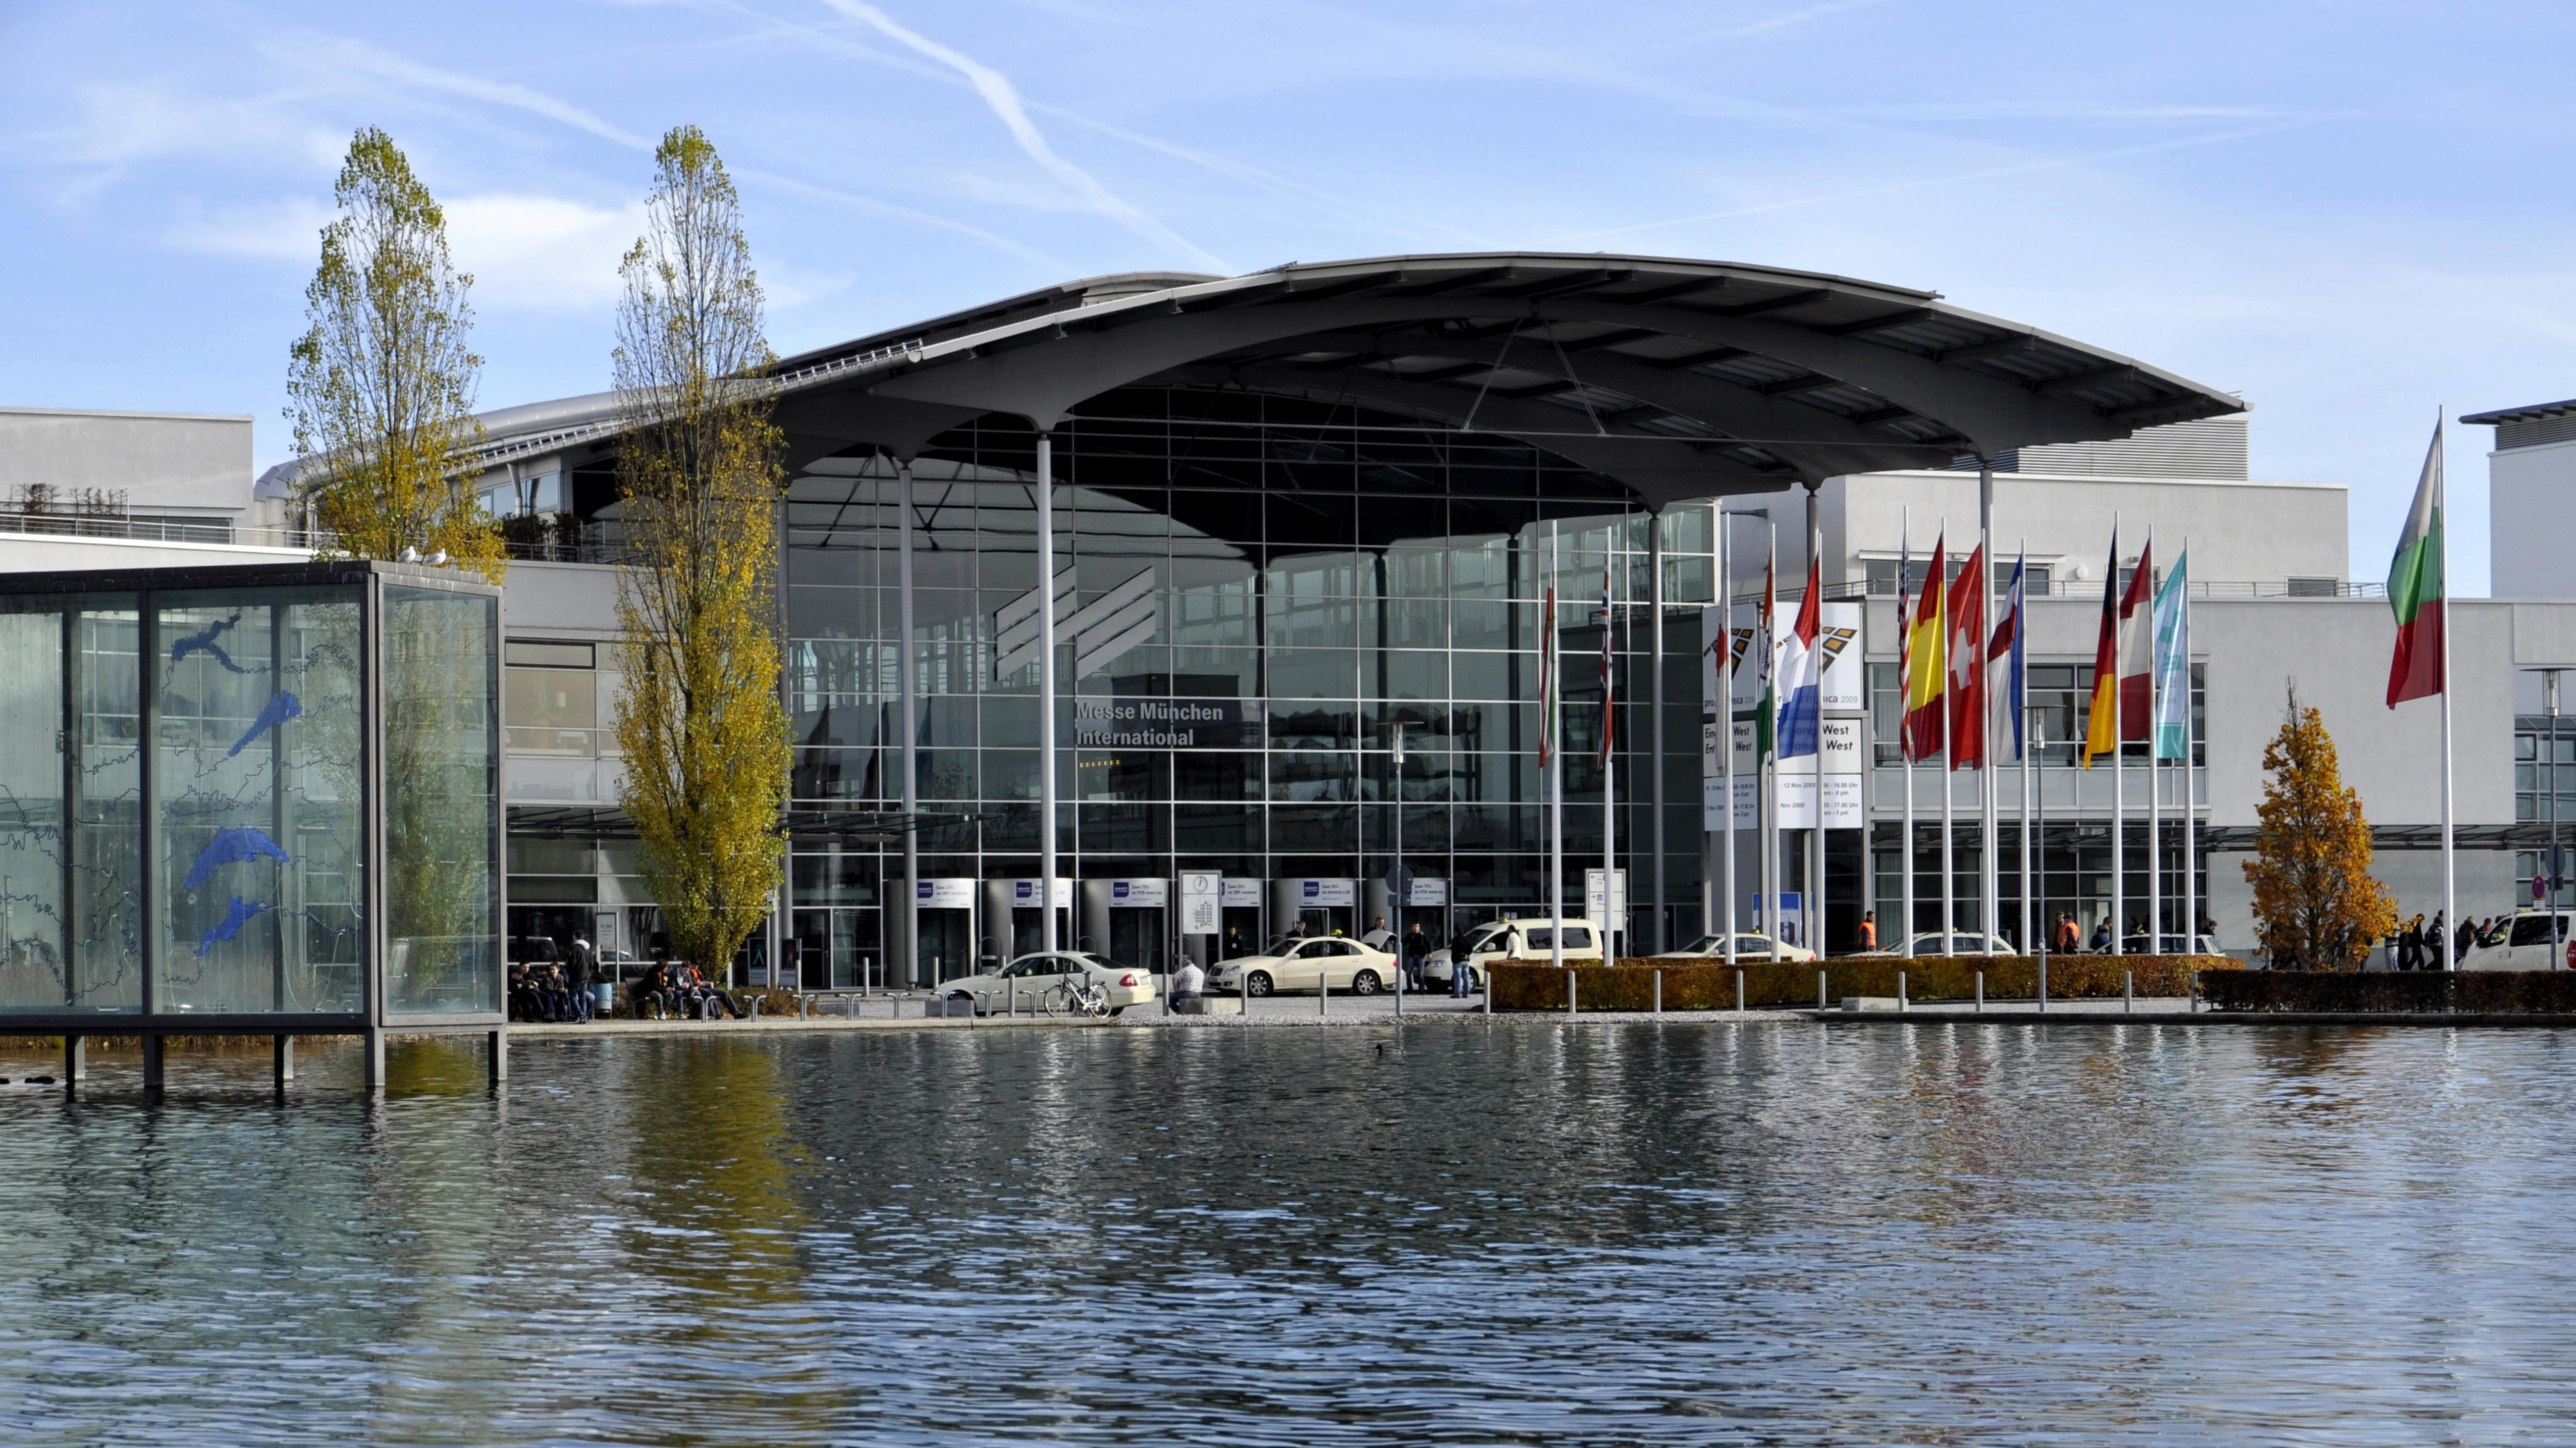 BAU/Messe München